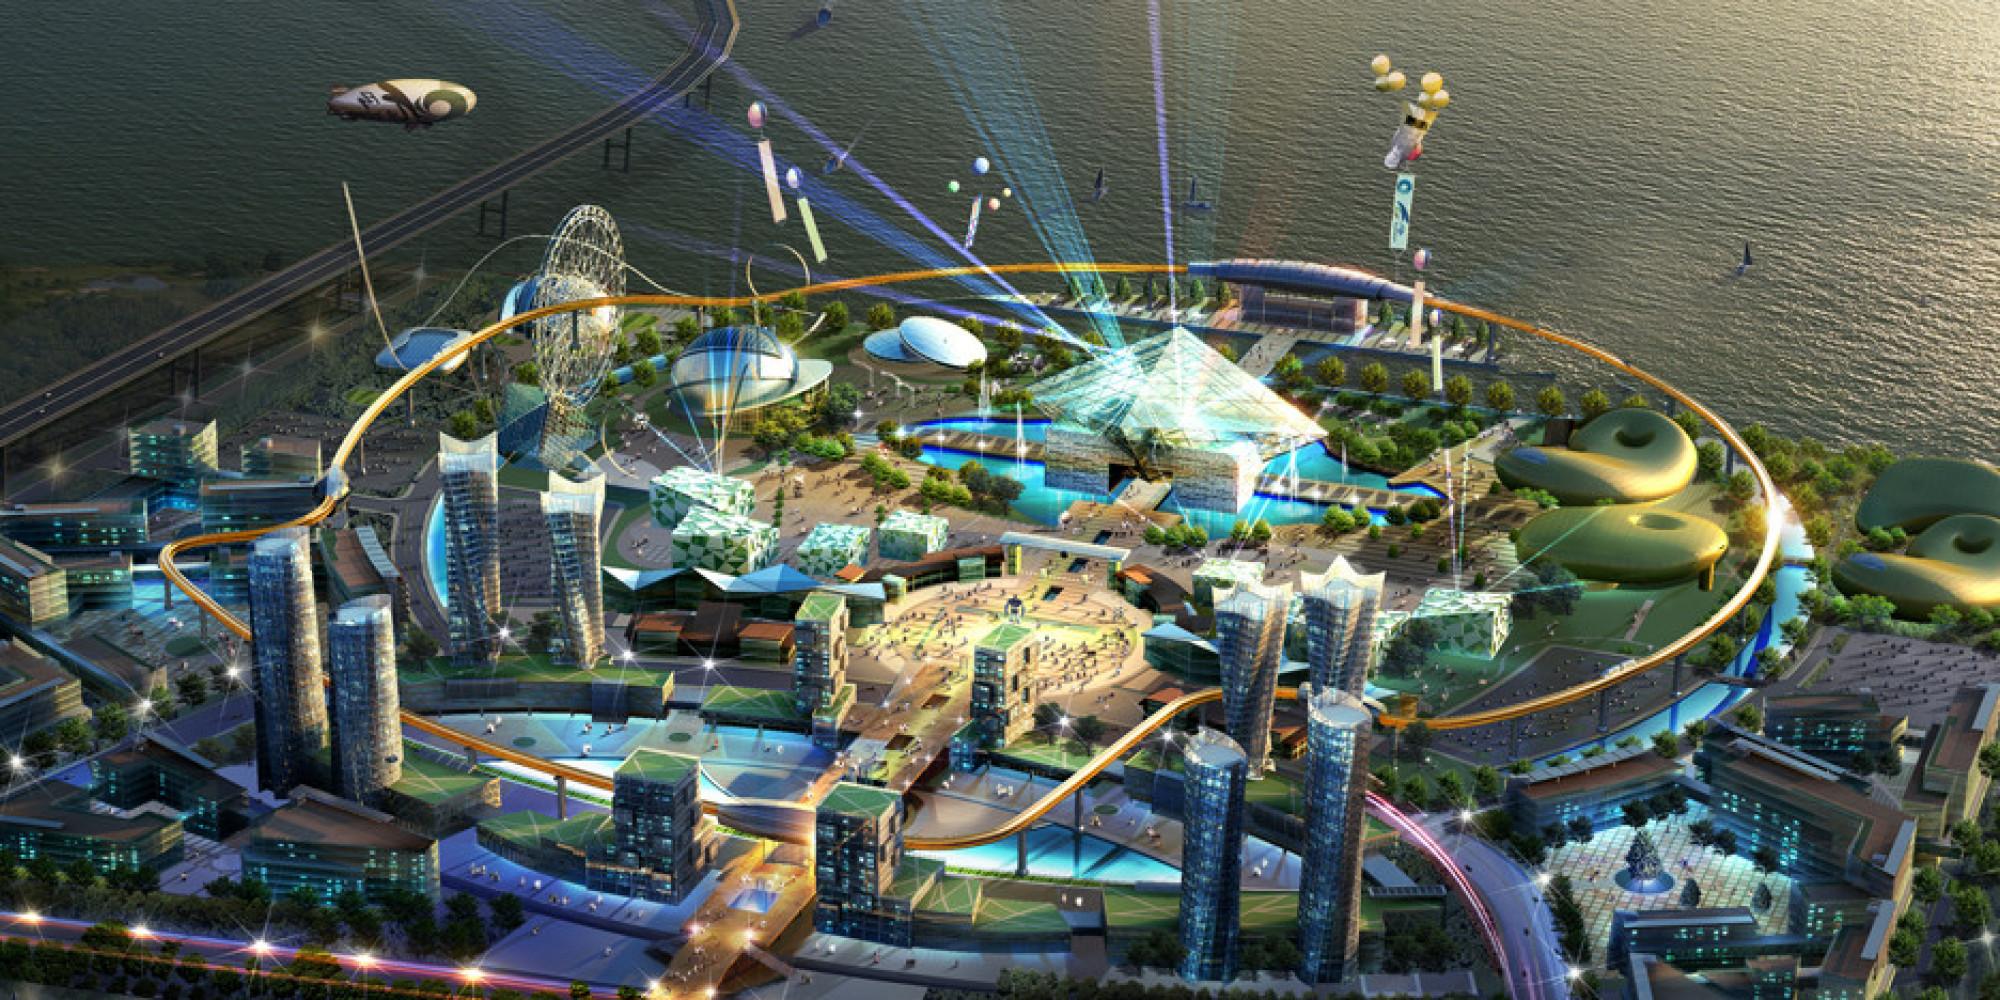 Robot Land South Korea S Theme Park Devoted To Robotics